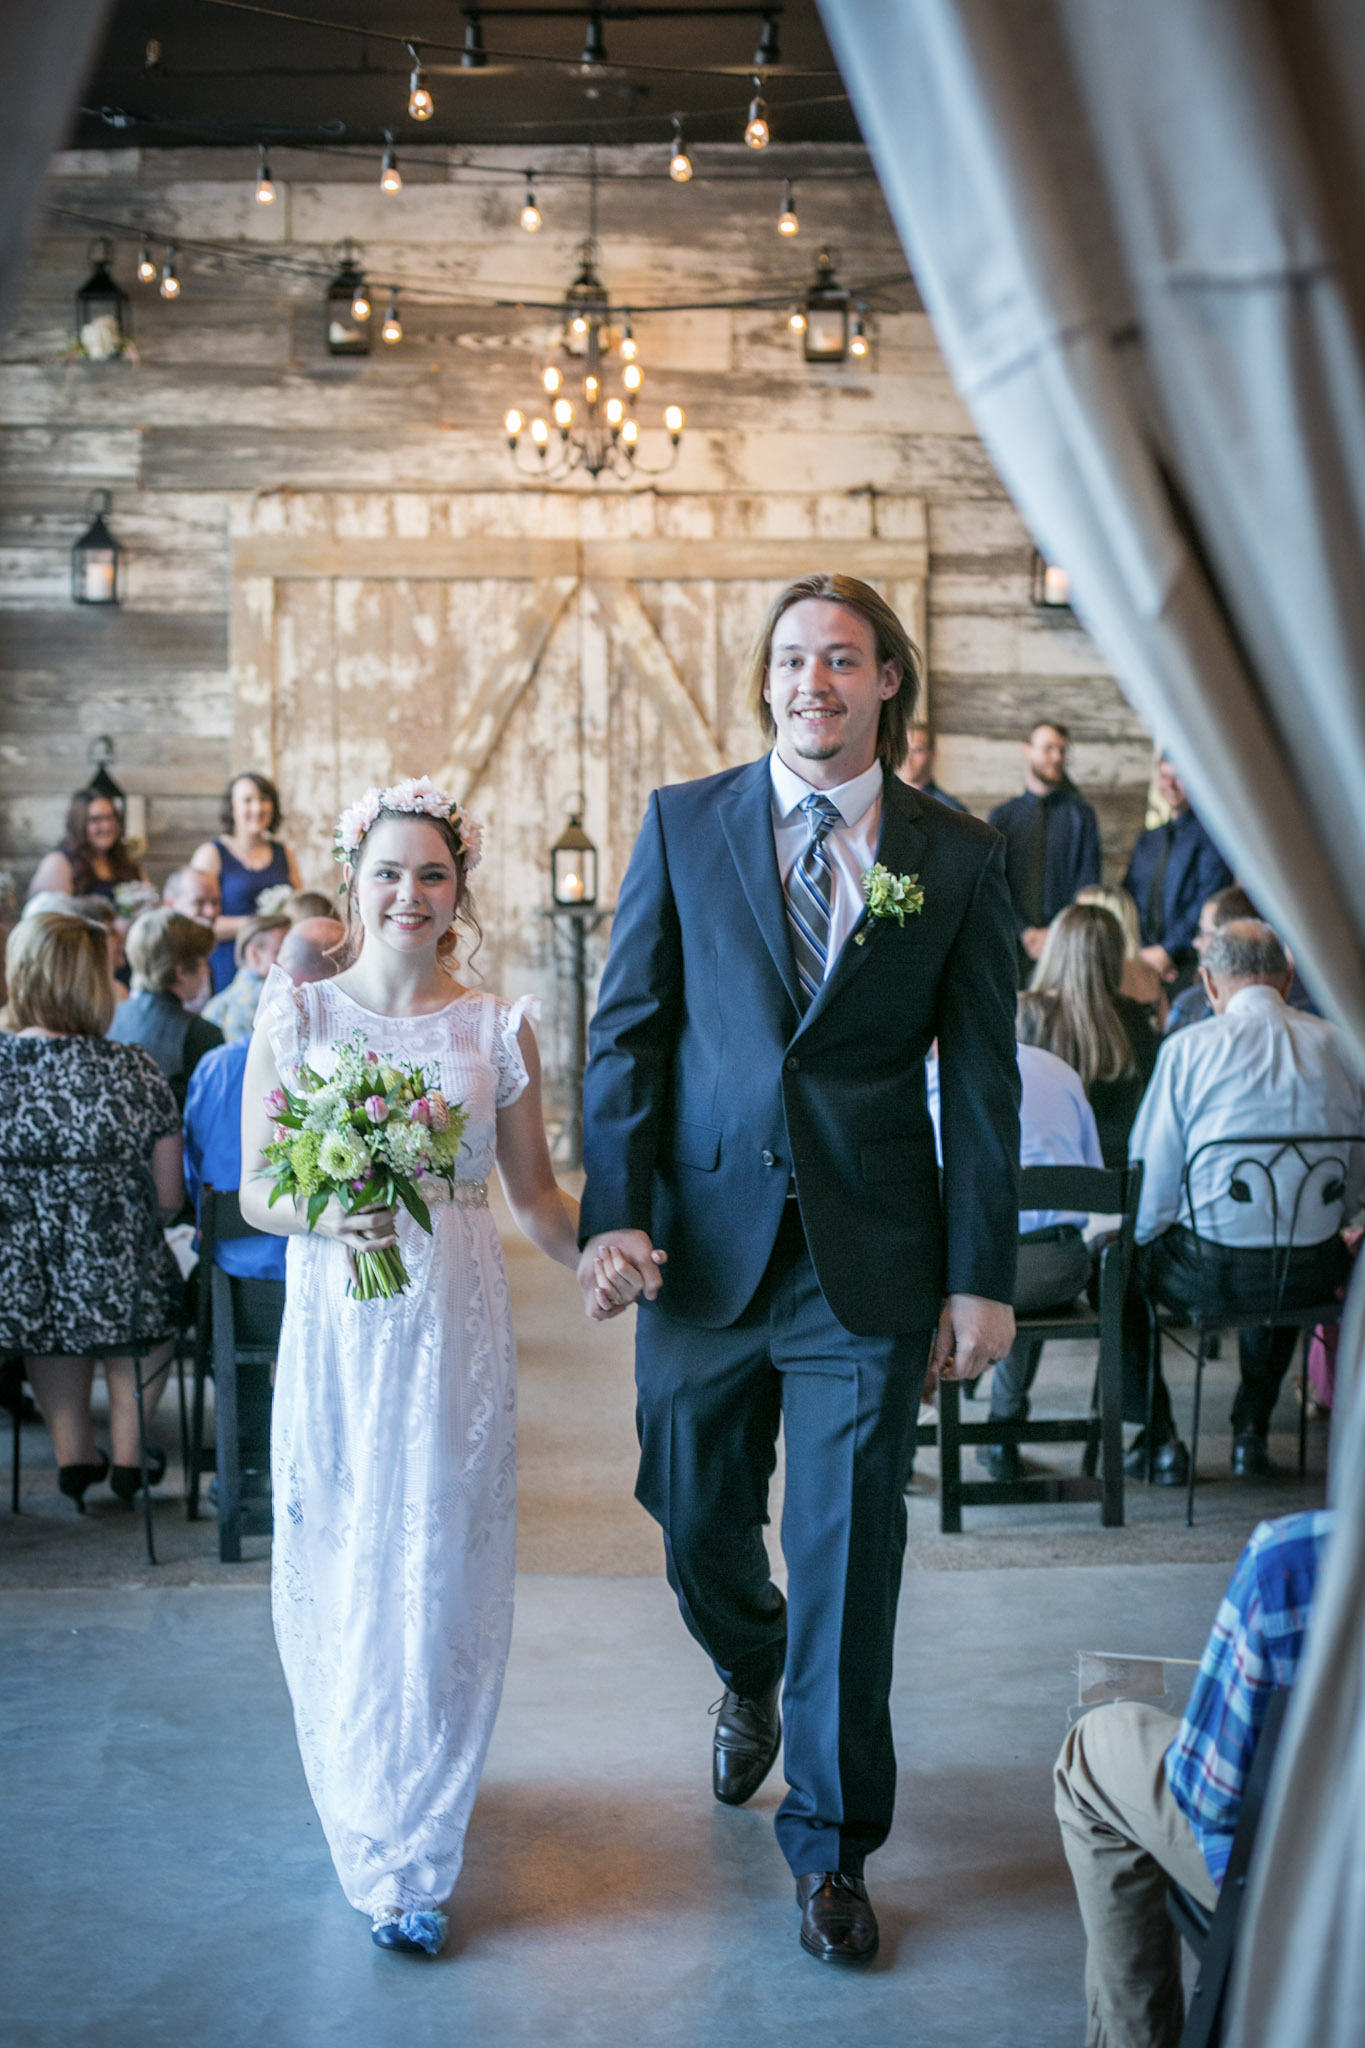 Kansas_City_Small_Wedding_Venue_Elope_Intimate_Ceremony_Budget_Affordable_Sophie&Philip_137.jpg